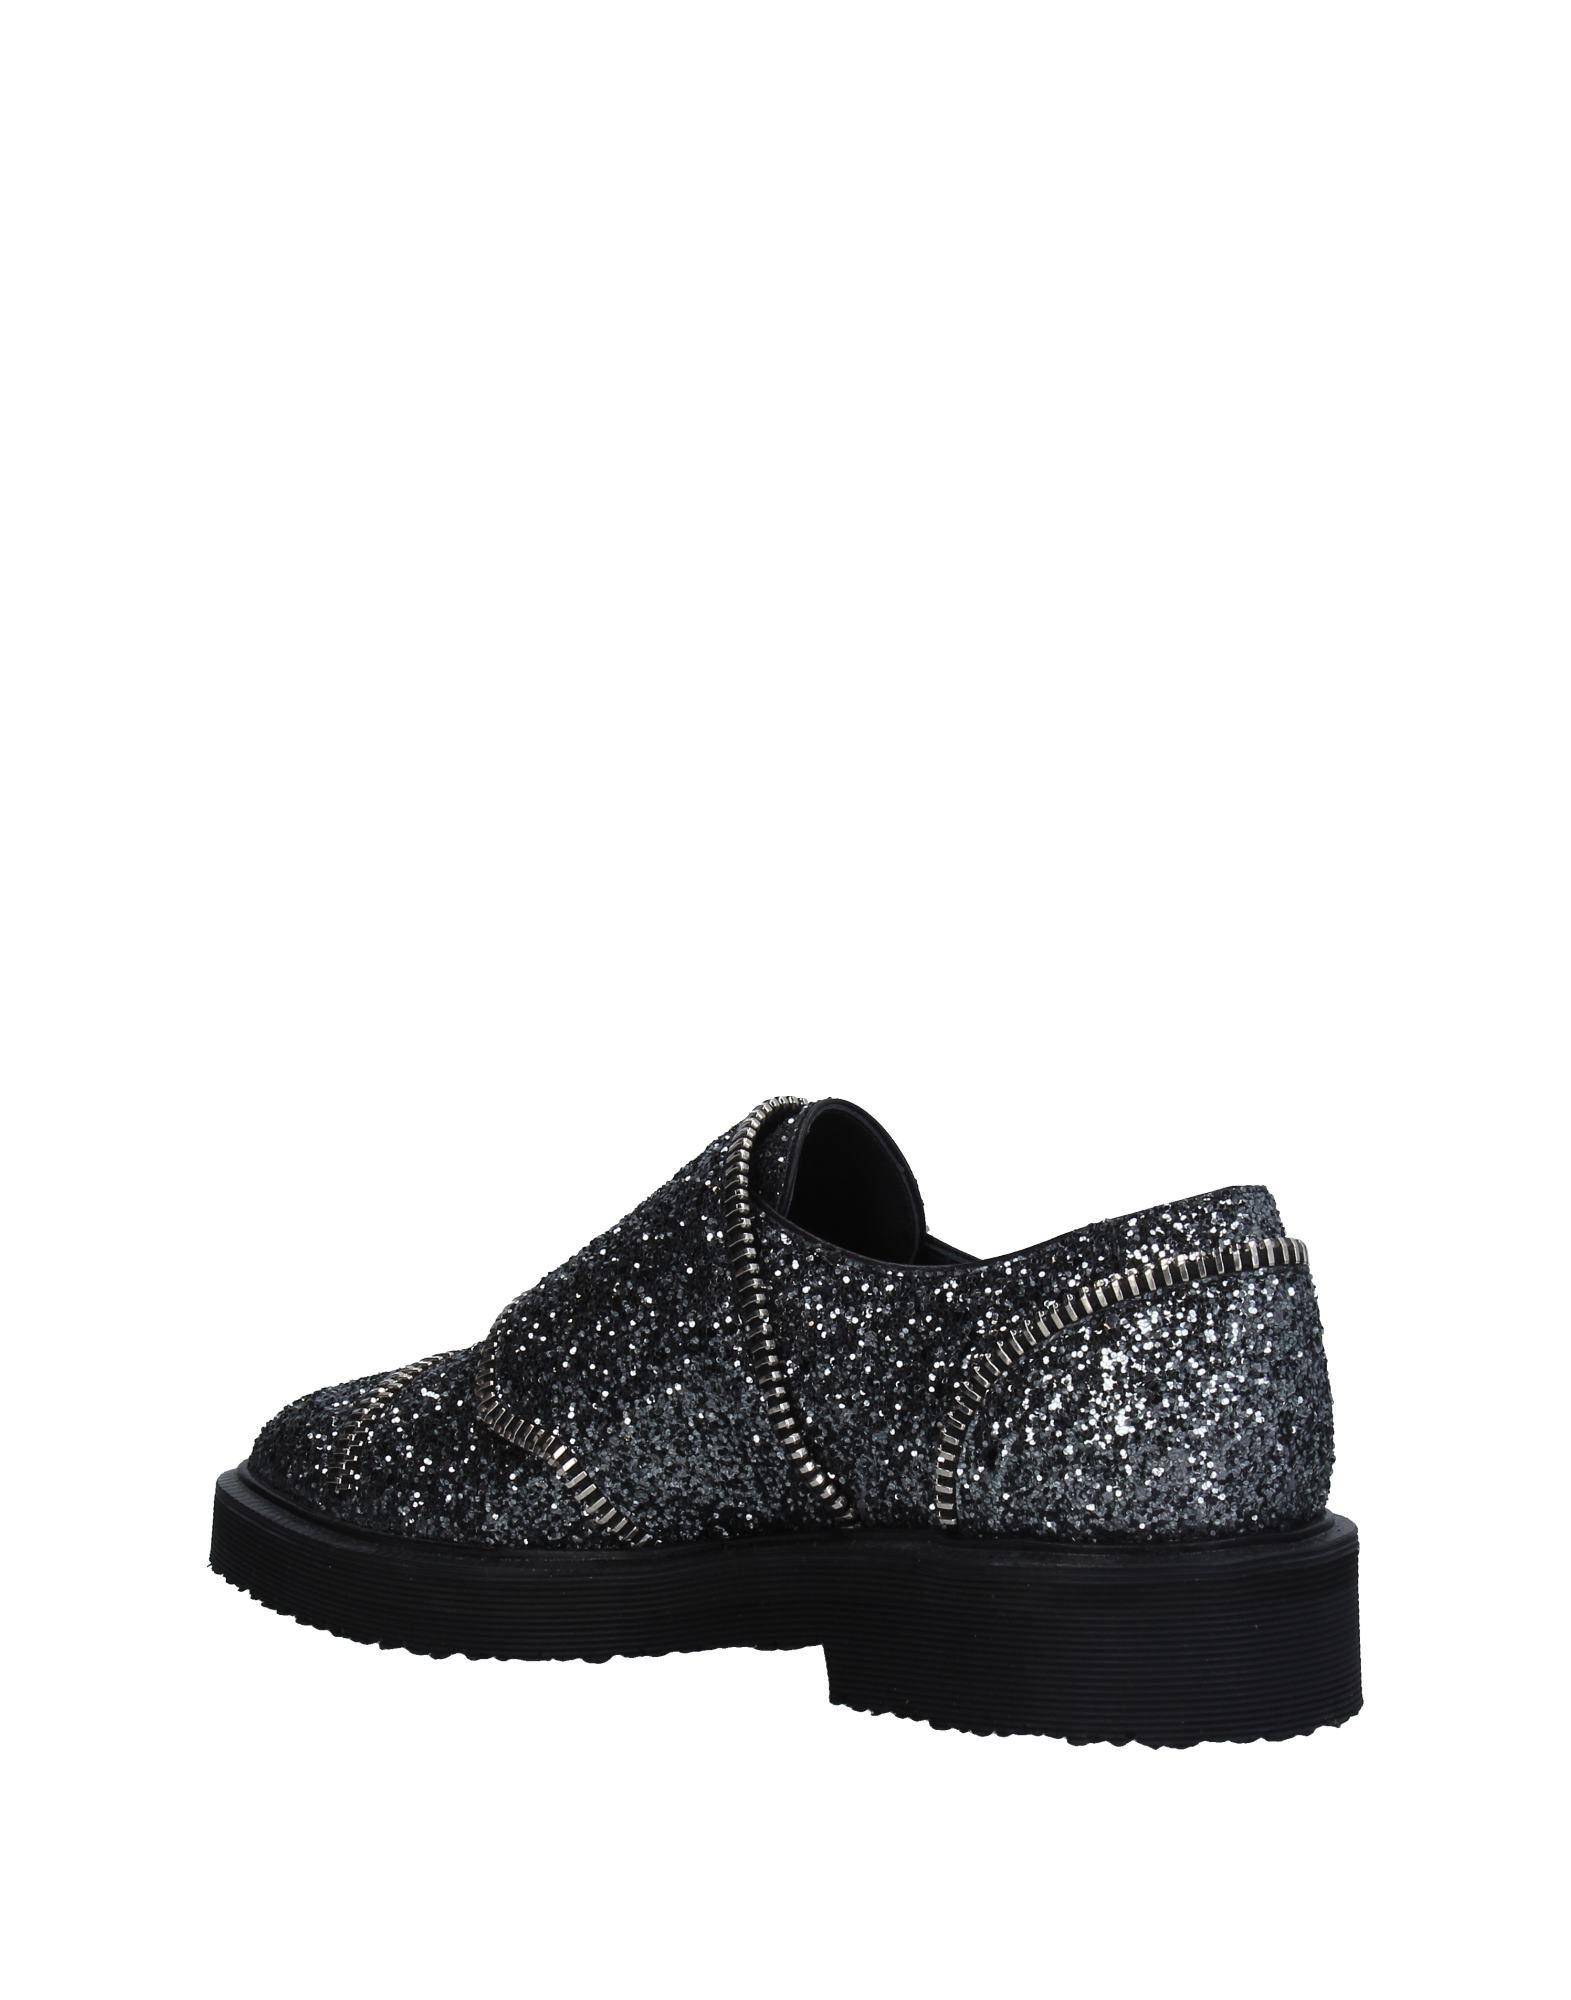 Giuseppe  Zanotti Mokassins Damen  Giuseppe 11330296VEGut aussehende strapazierfähige Schuhe 7fbe47